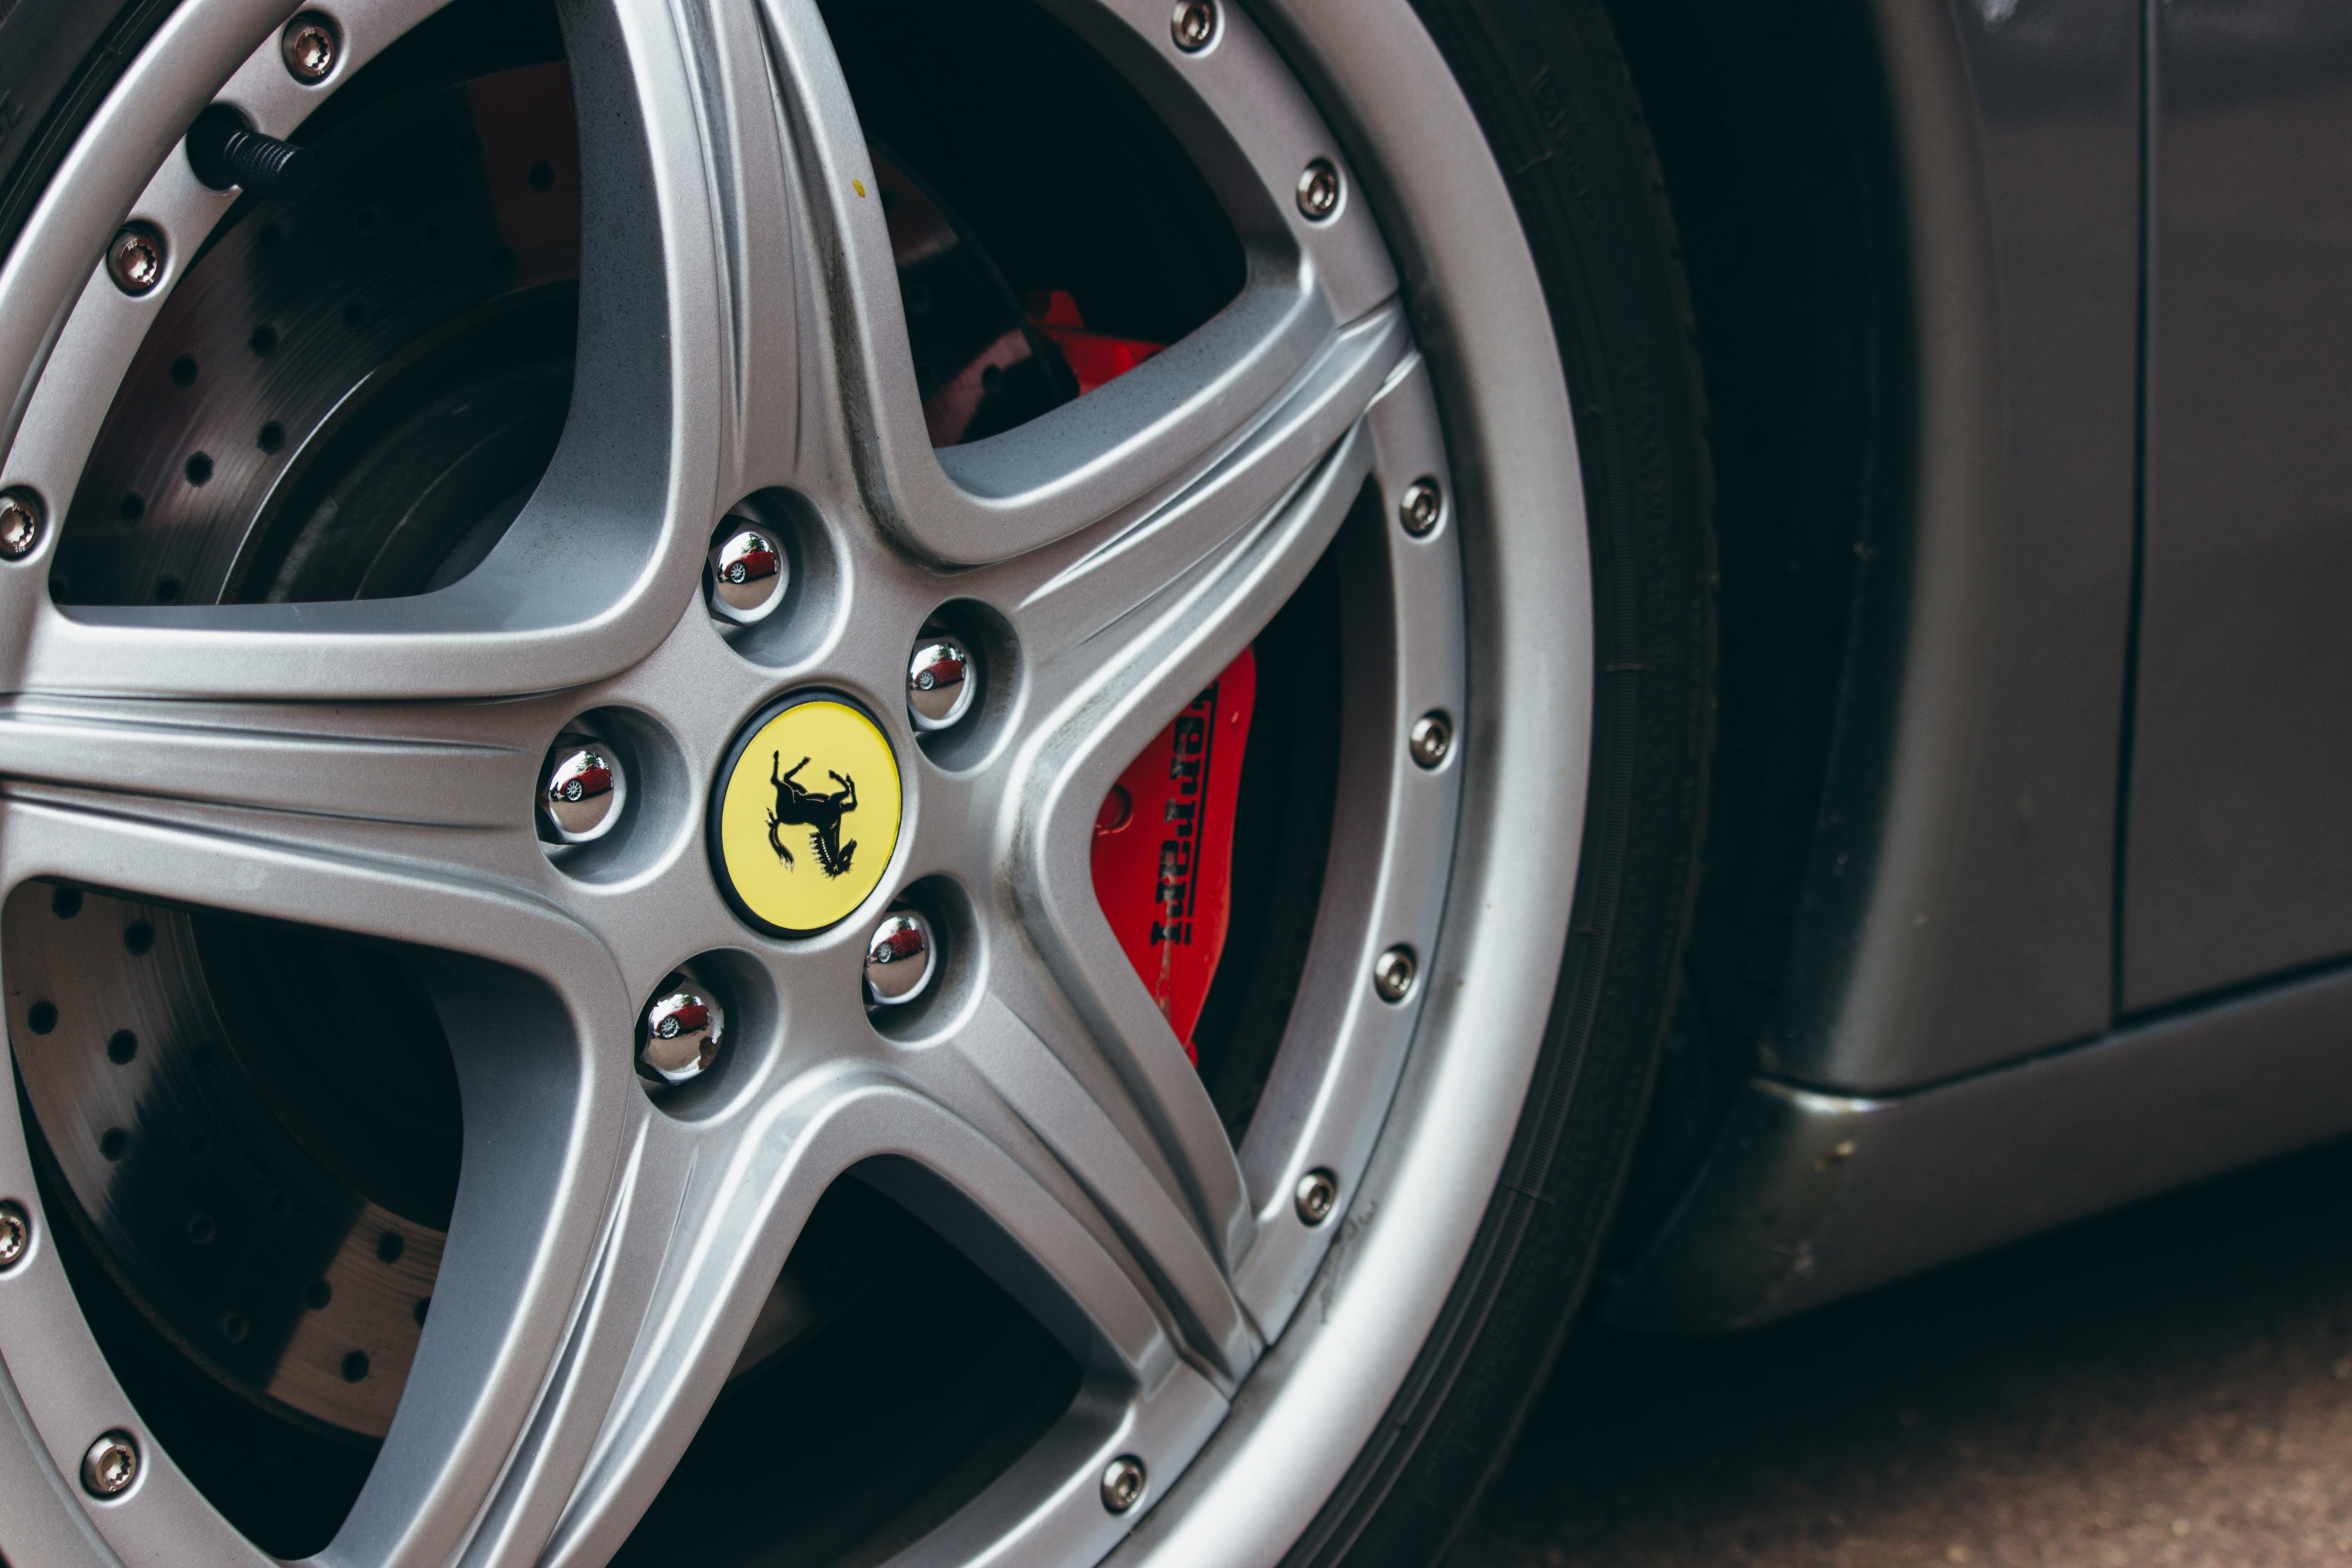 A sports car hubcap.